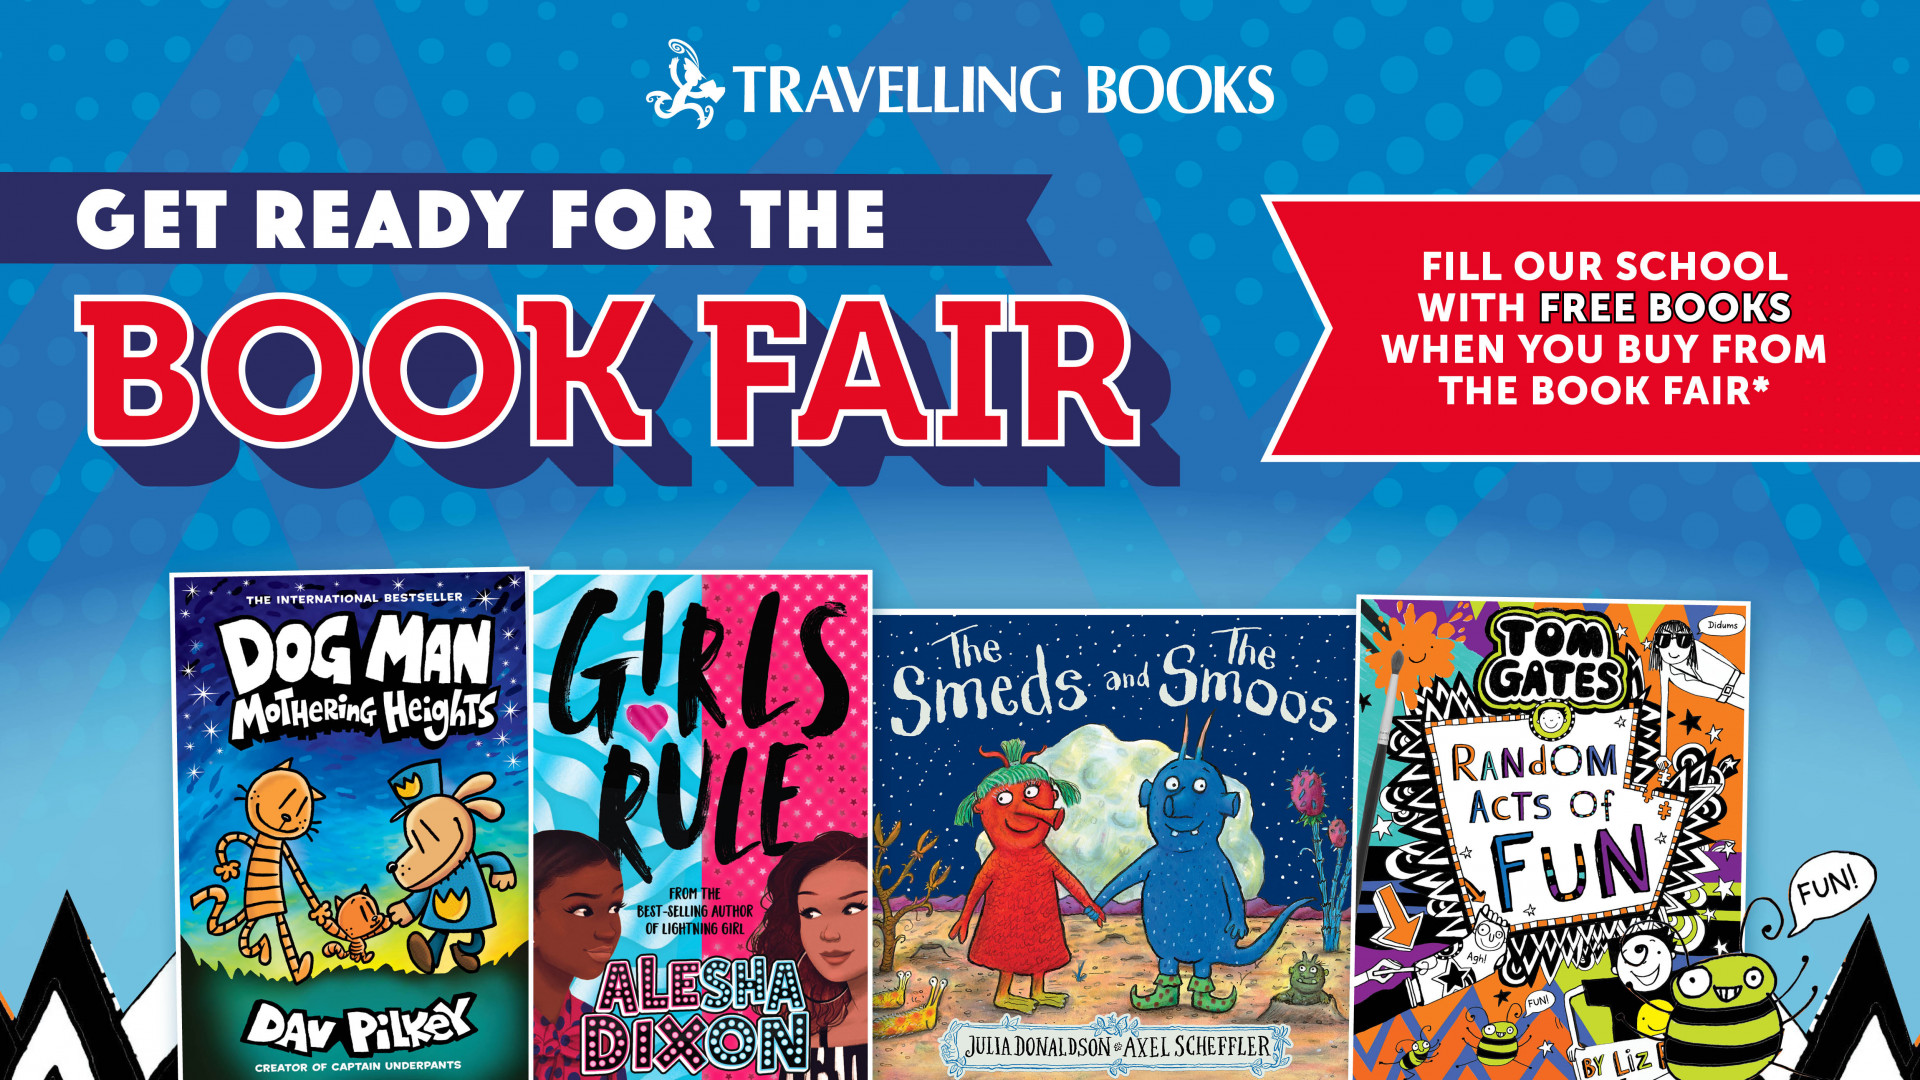 travelling-book-fairs-social-asset-autumn-2021-2028999.jpg